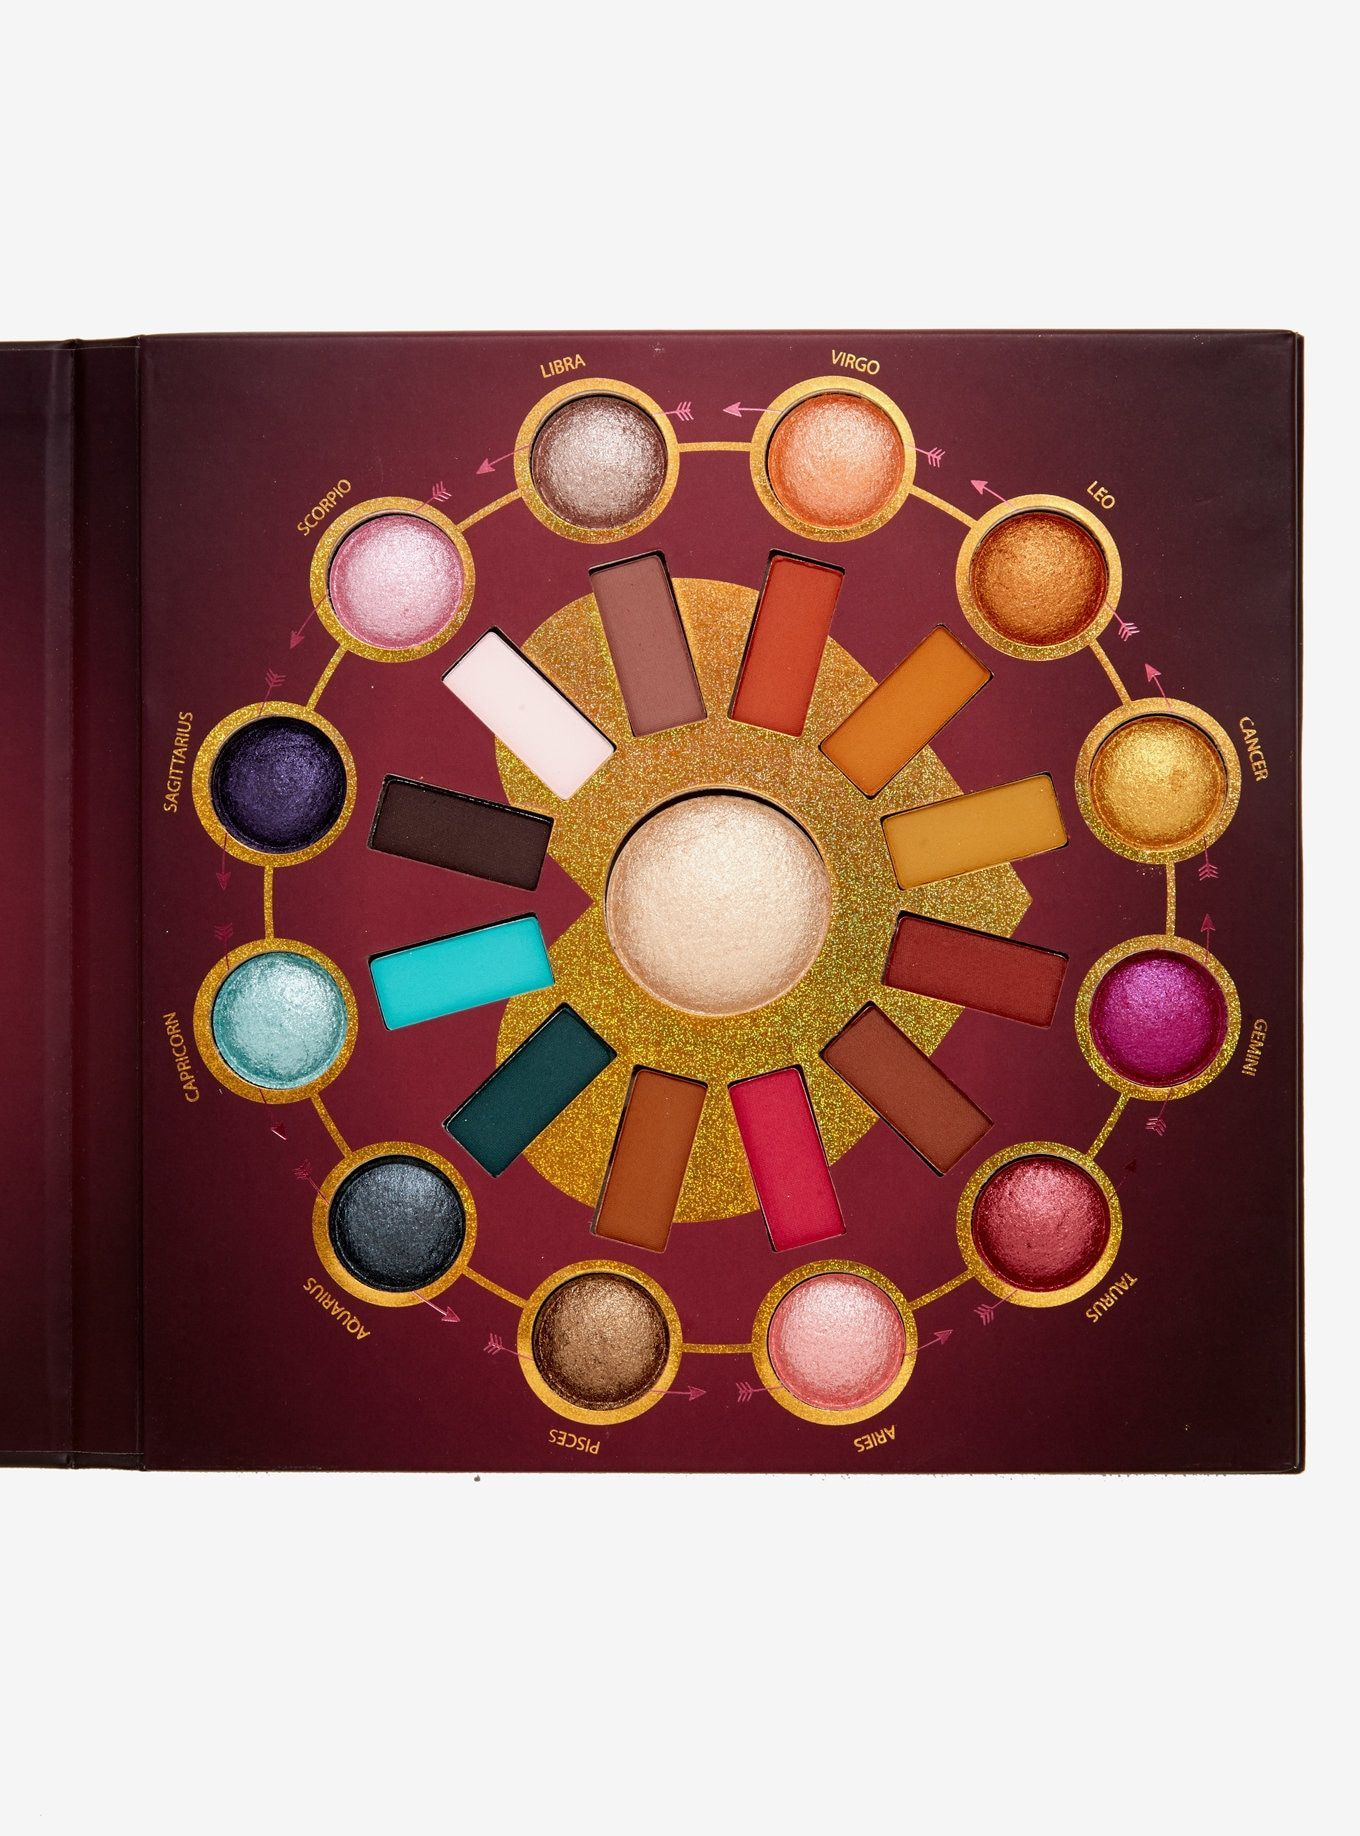 BH Cosmetics Zodiac Love Signs 25 Color Eyeshadow